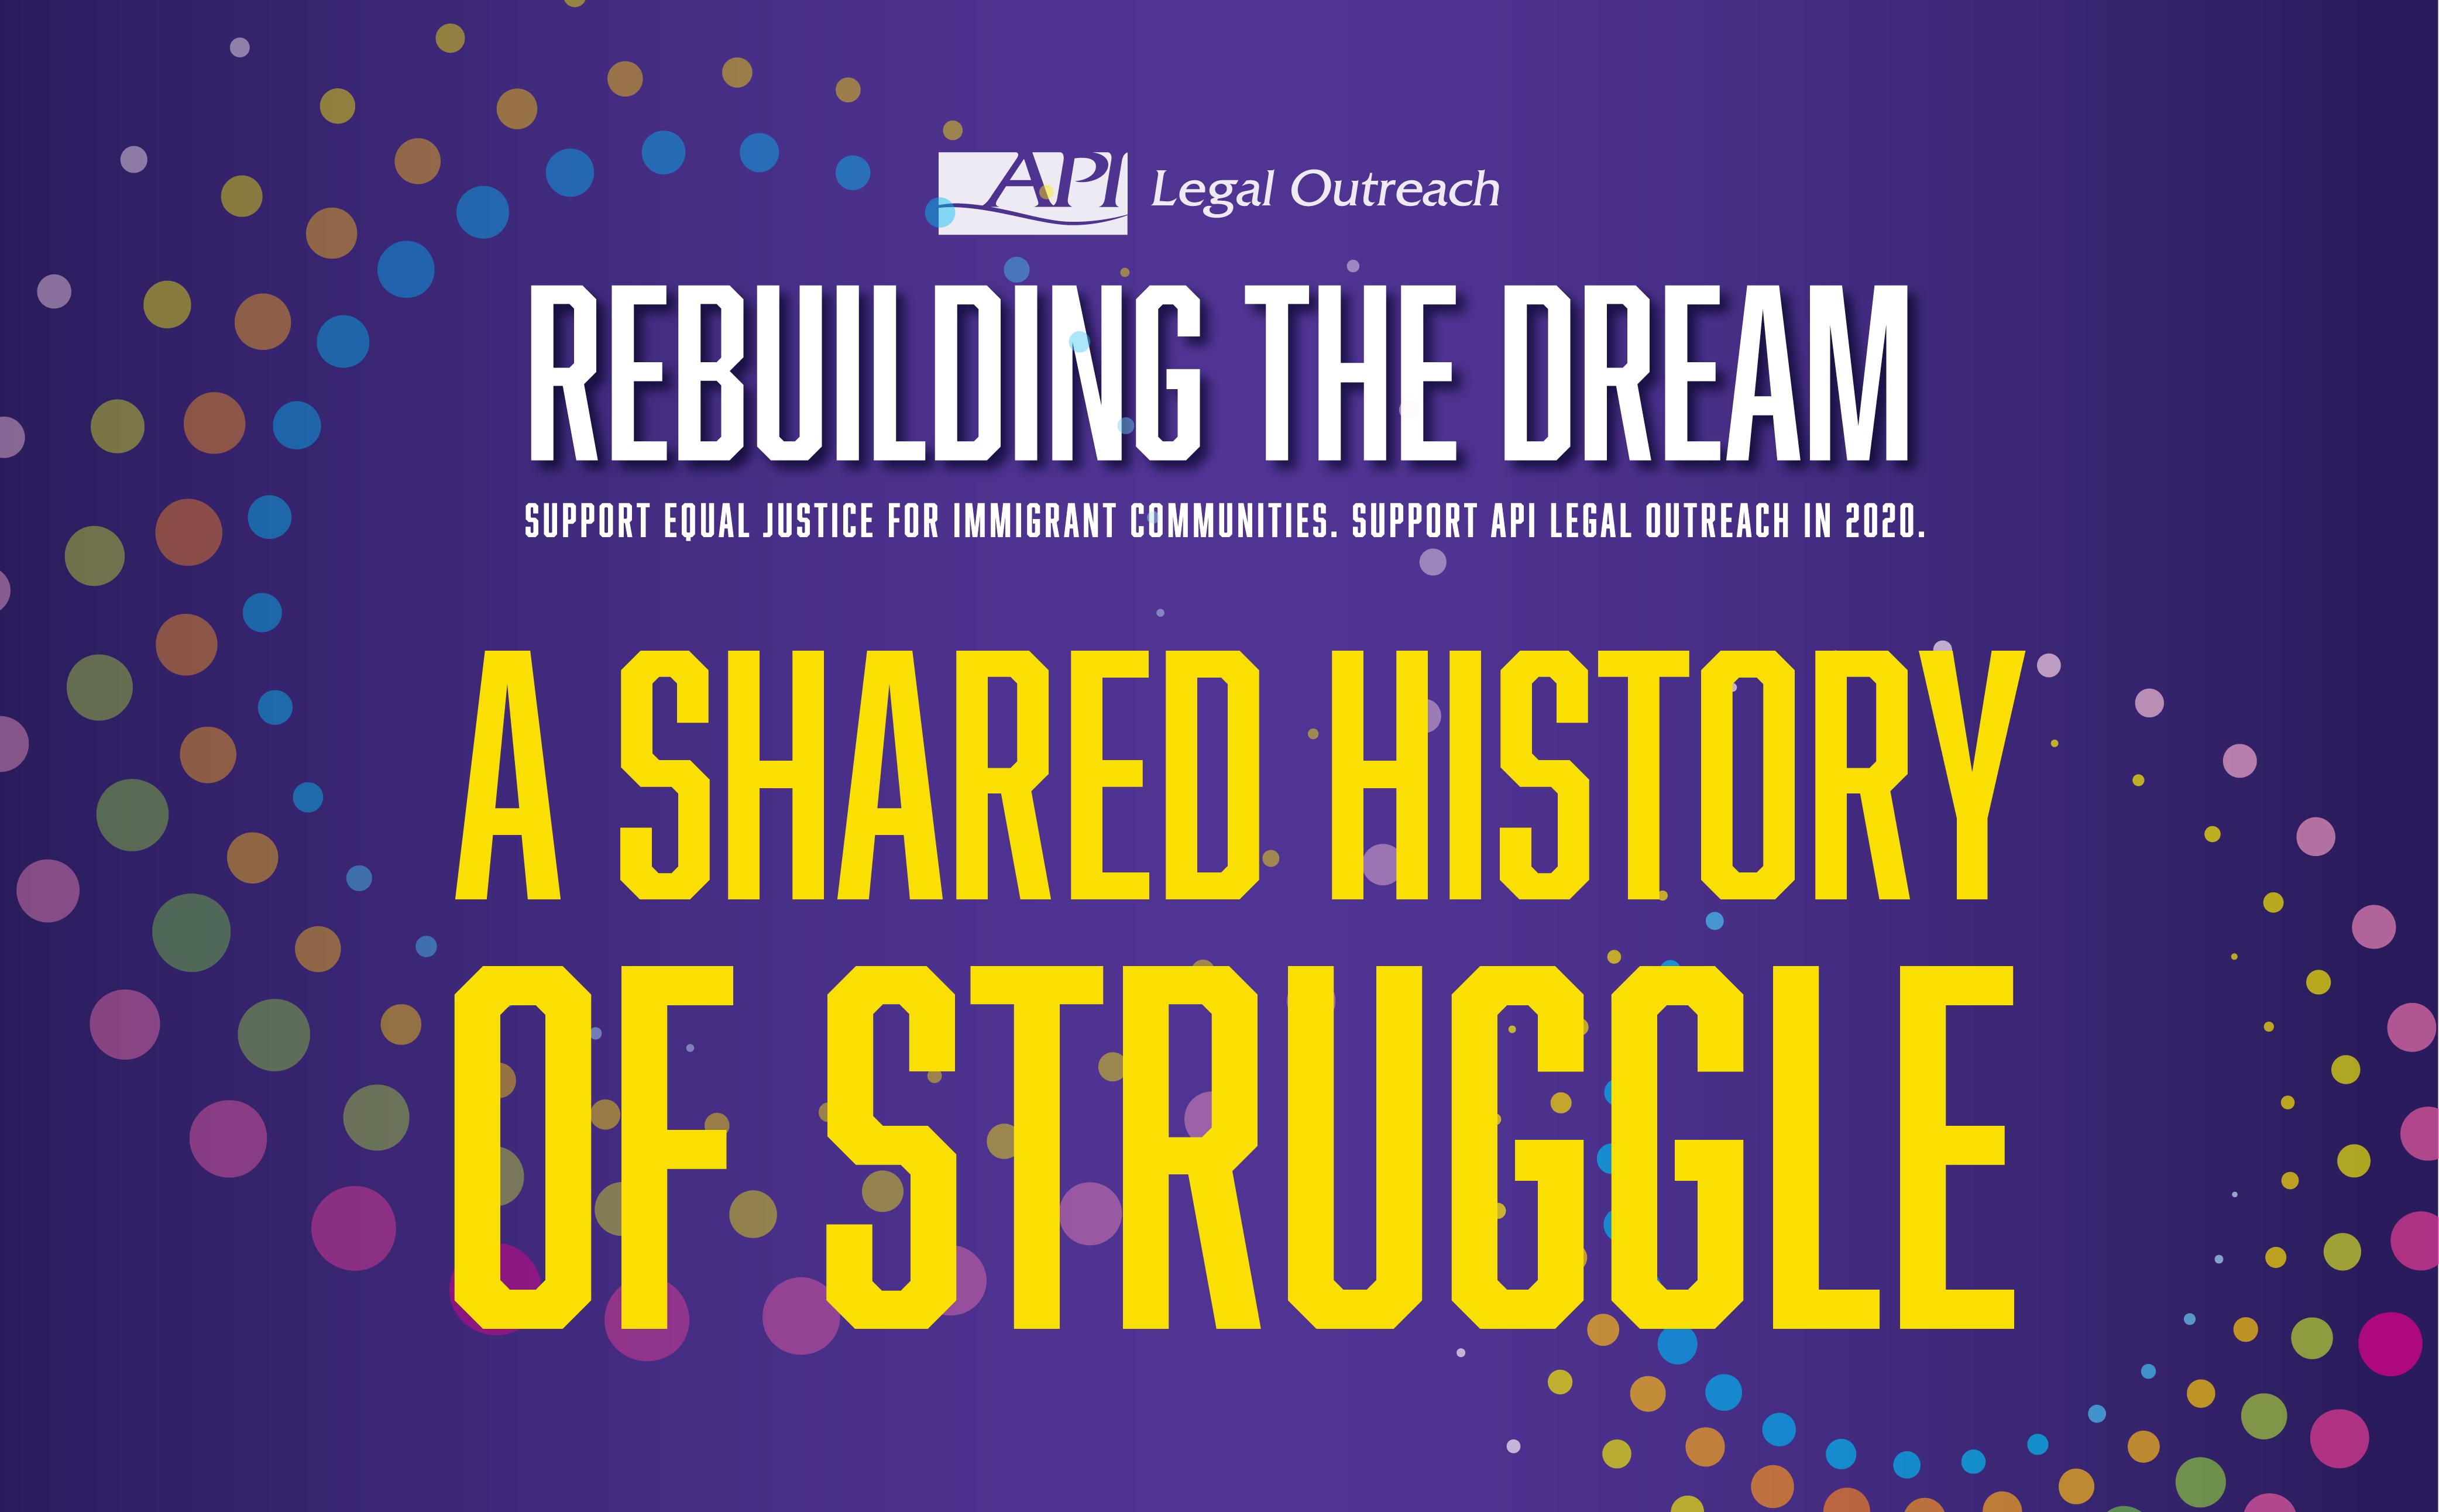 A Shared History of Struggle